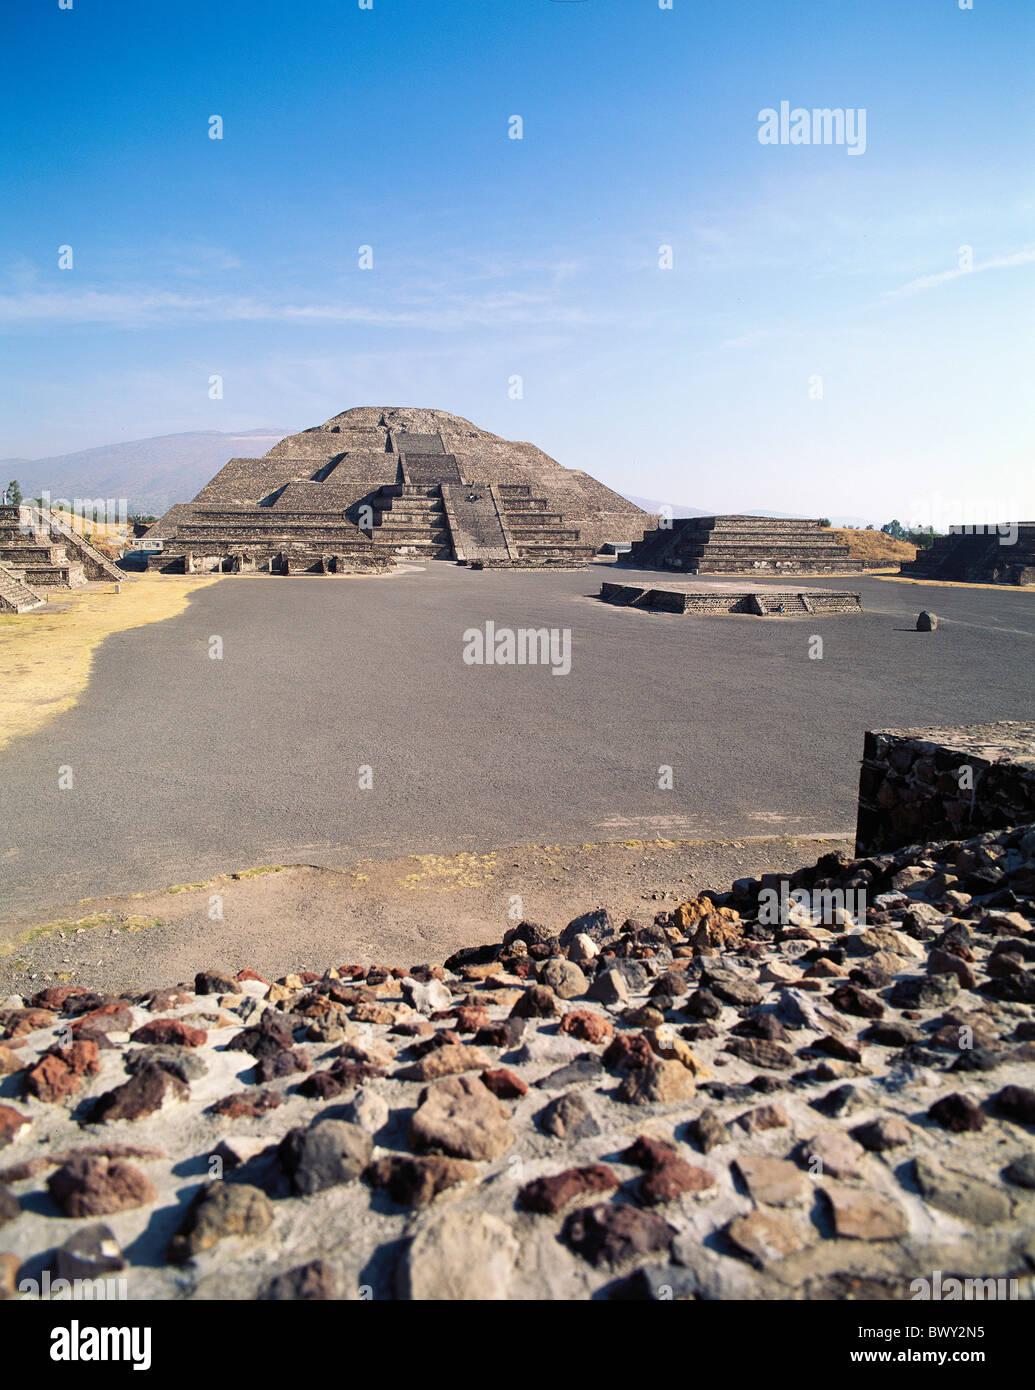 Allee der Toten Kultur Mexiko Mittelamerika Lateinamerika Mond Pyramide Teotihuacan Todesstrasse Stockbild